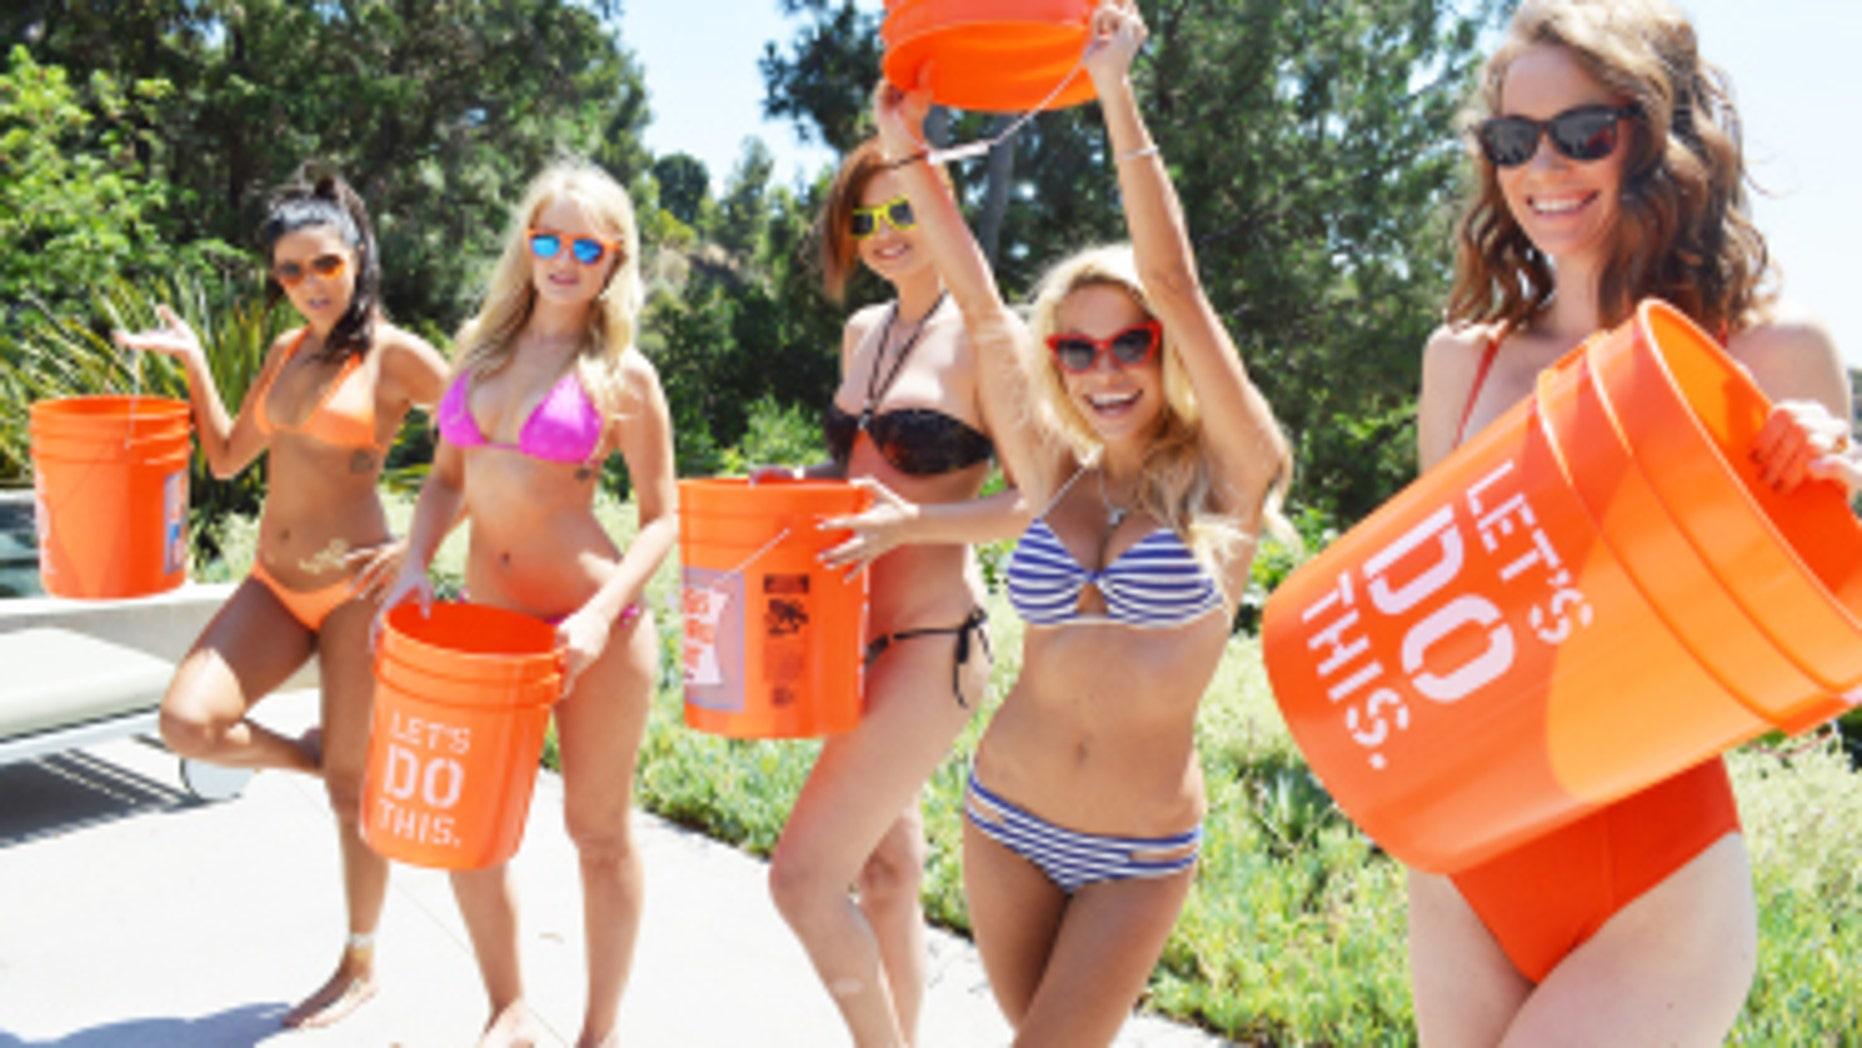 Five Playmates take on the Ice Bucket Challenge.